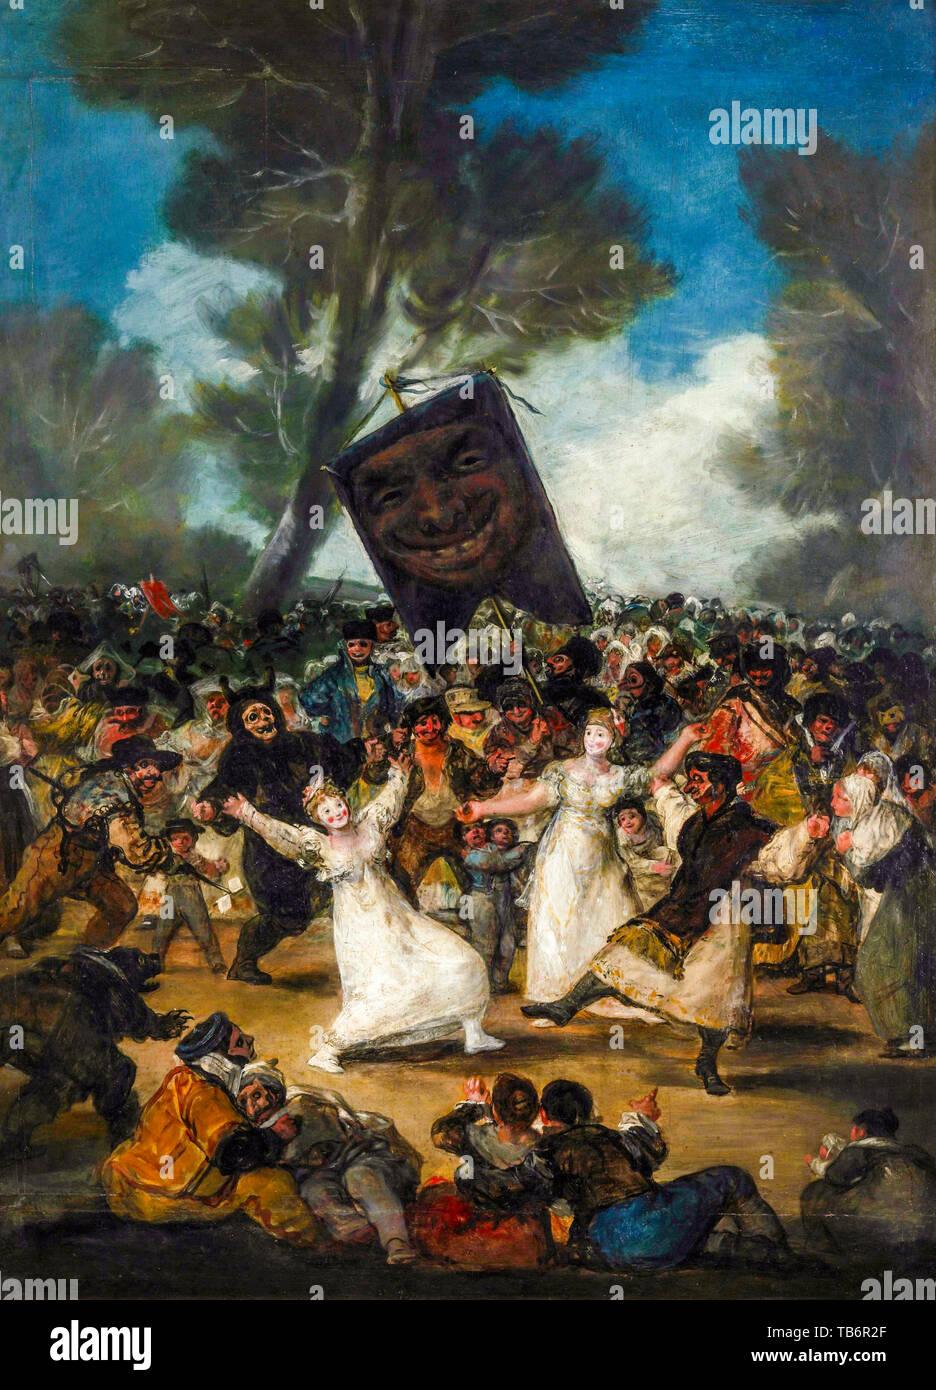 Francisco Goya, The Burial of the Sardine, painting, circa 1812 - Stock Image